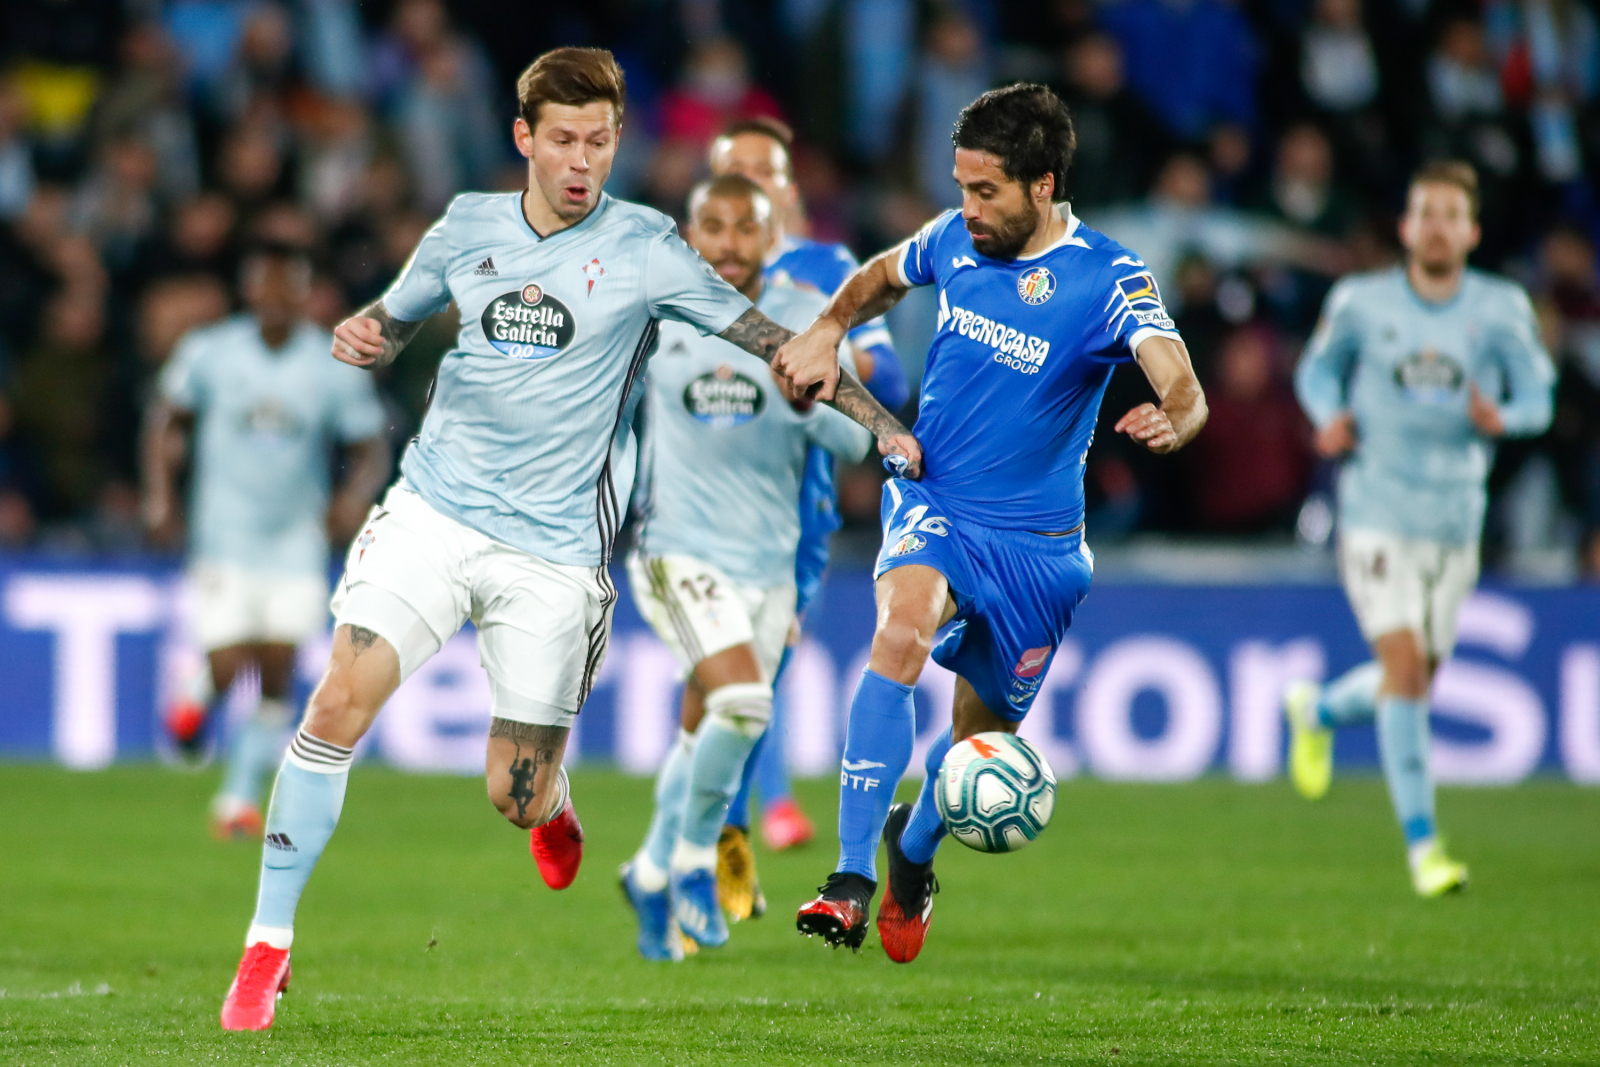 «Мальорка» - «Сельта»: прогноз на матч чемпионата Испании